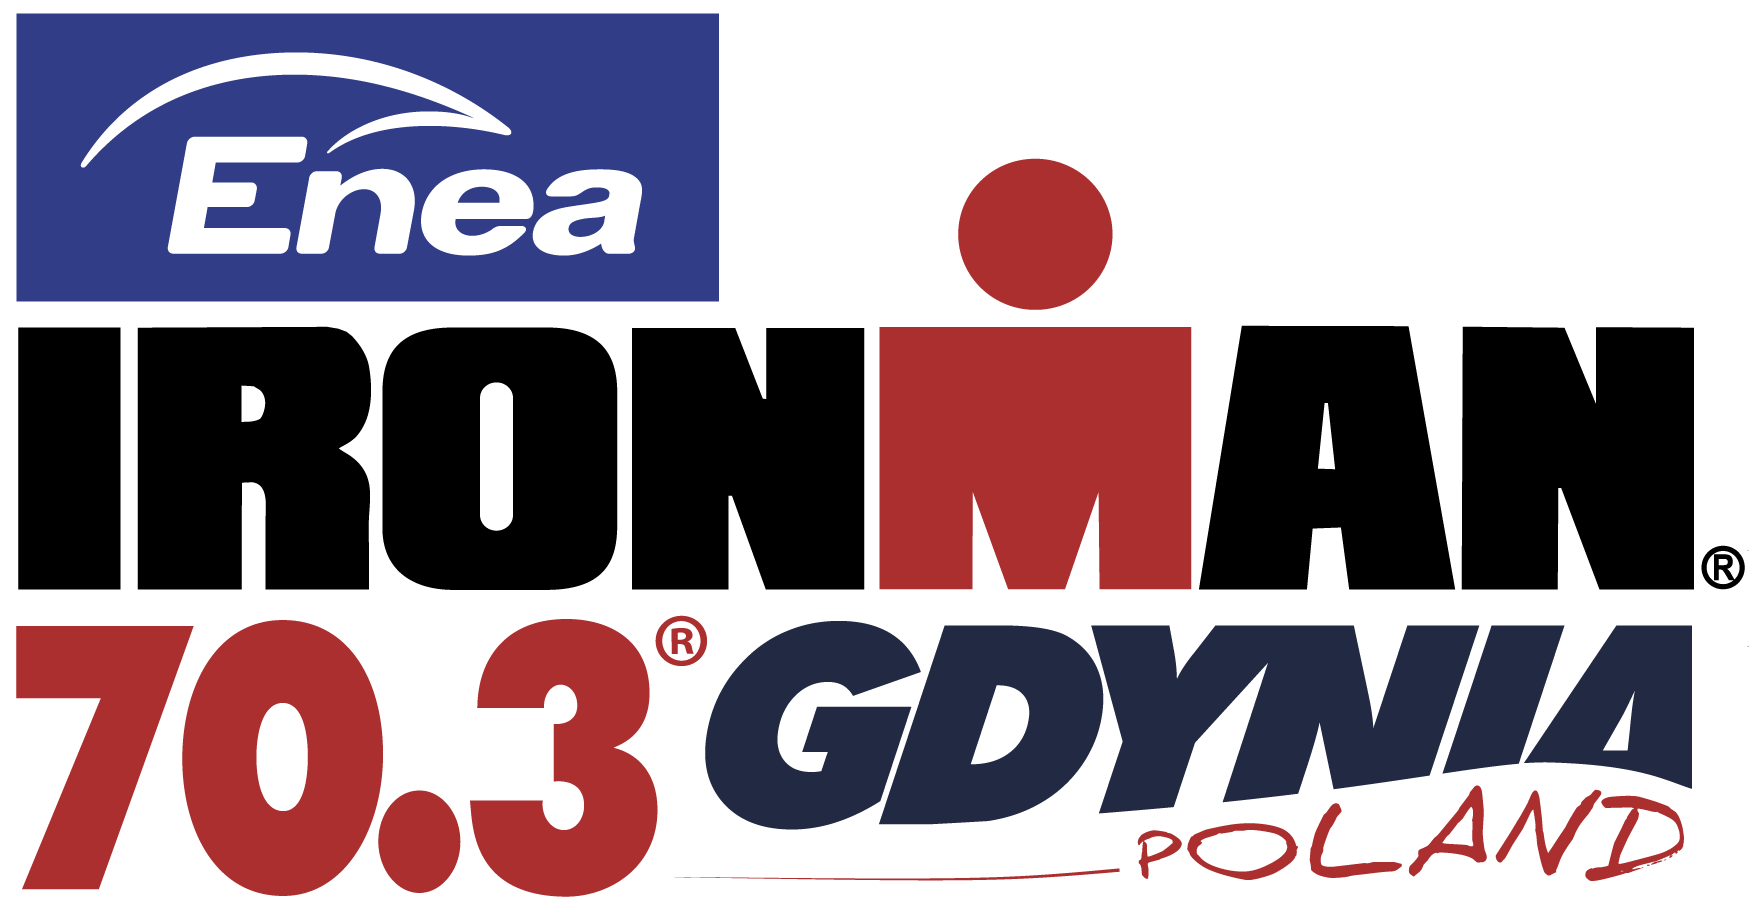 IRONMAN 70.3 Gdynia Logo